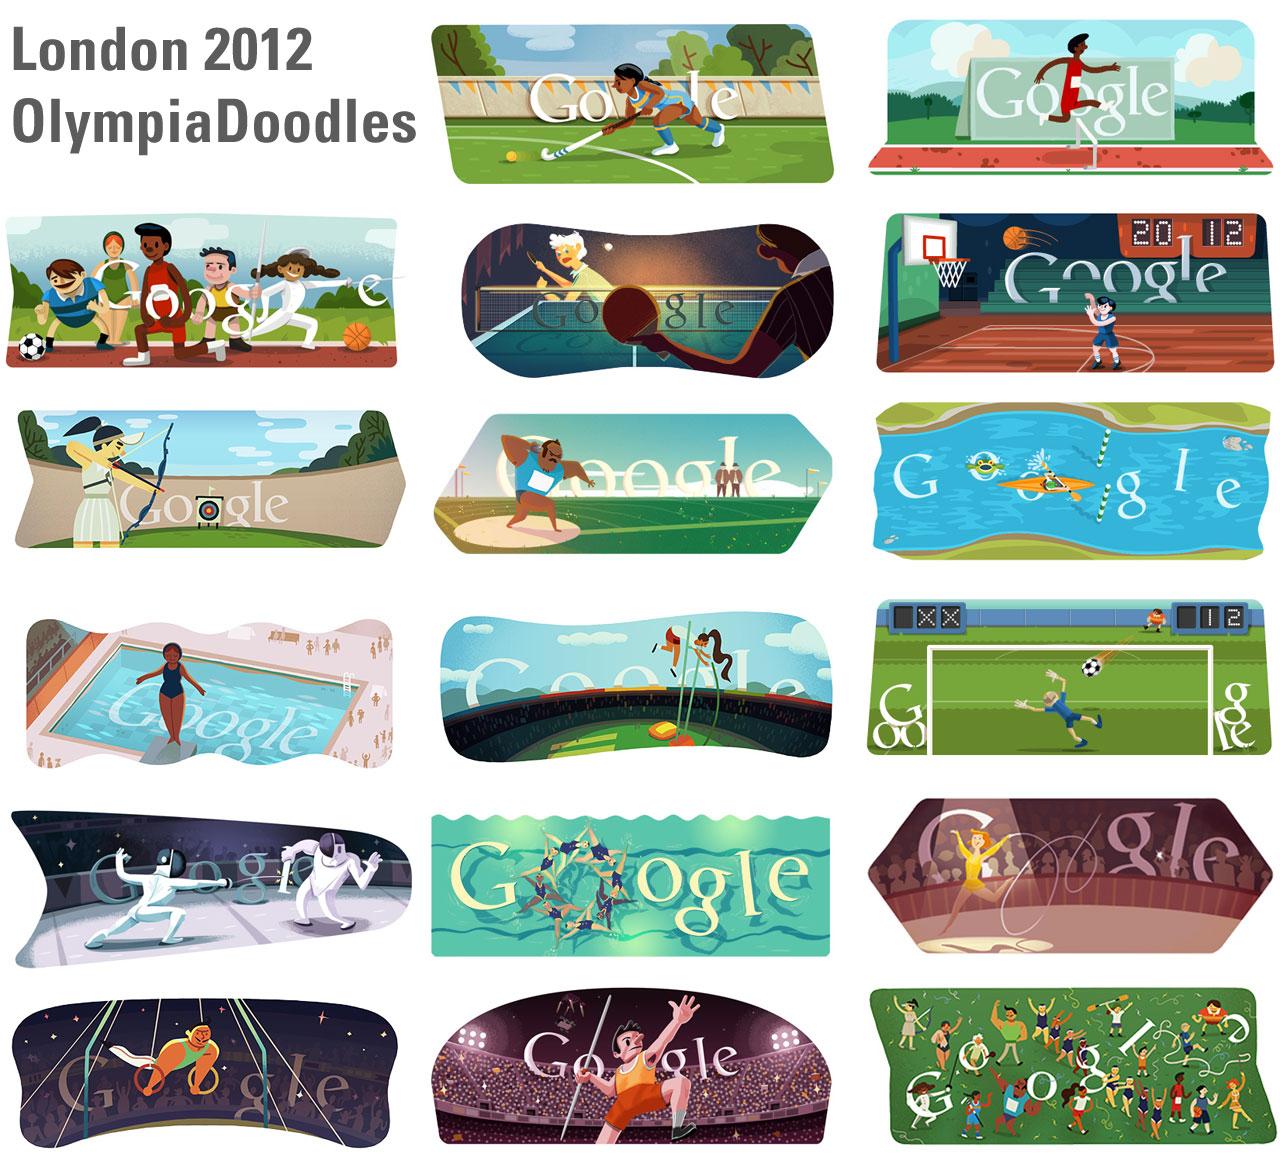 London 2012 schlussfeier – alle olympia doodles im überblick